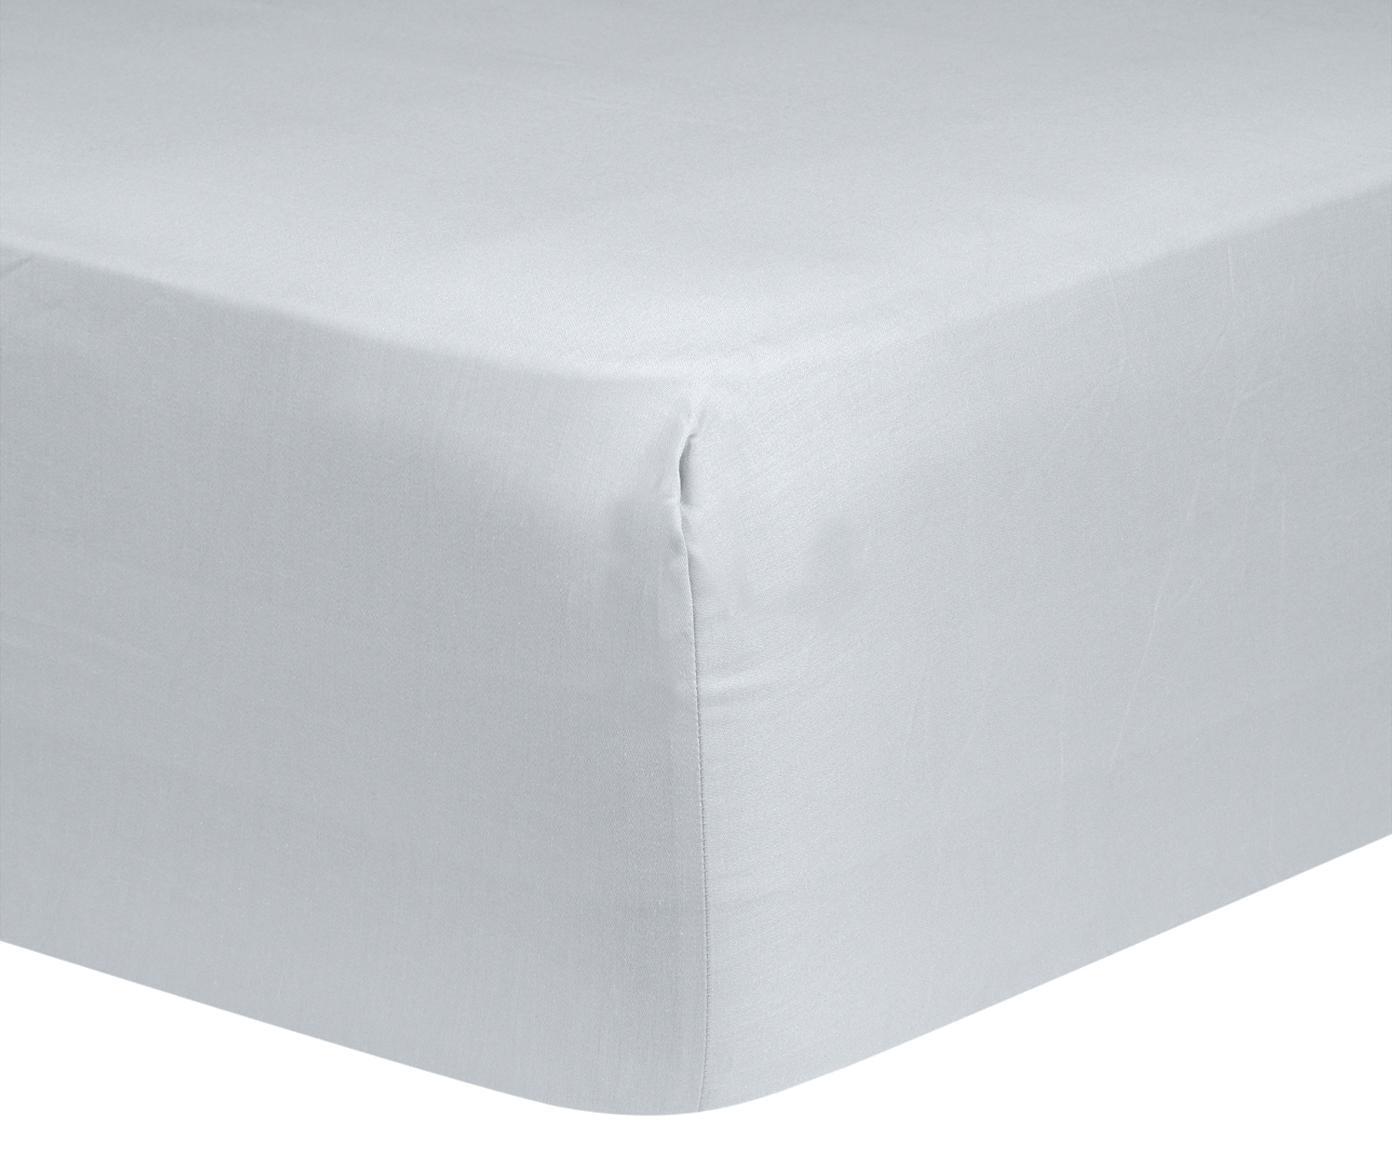 Sábana bajera de satén Comfort, Gris claro, Cama 90 cm (90 x 200 cm)